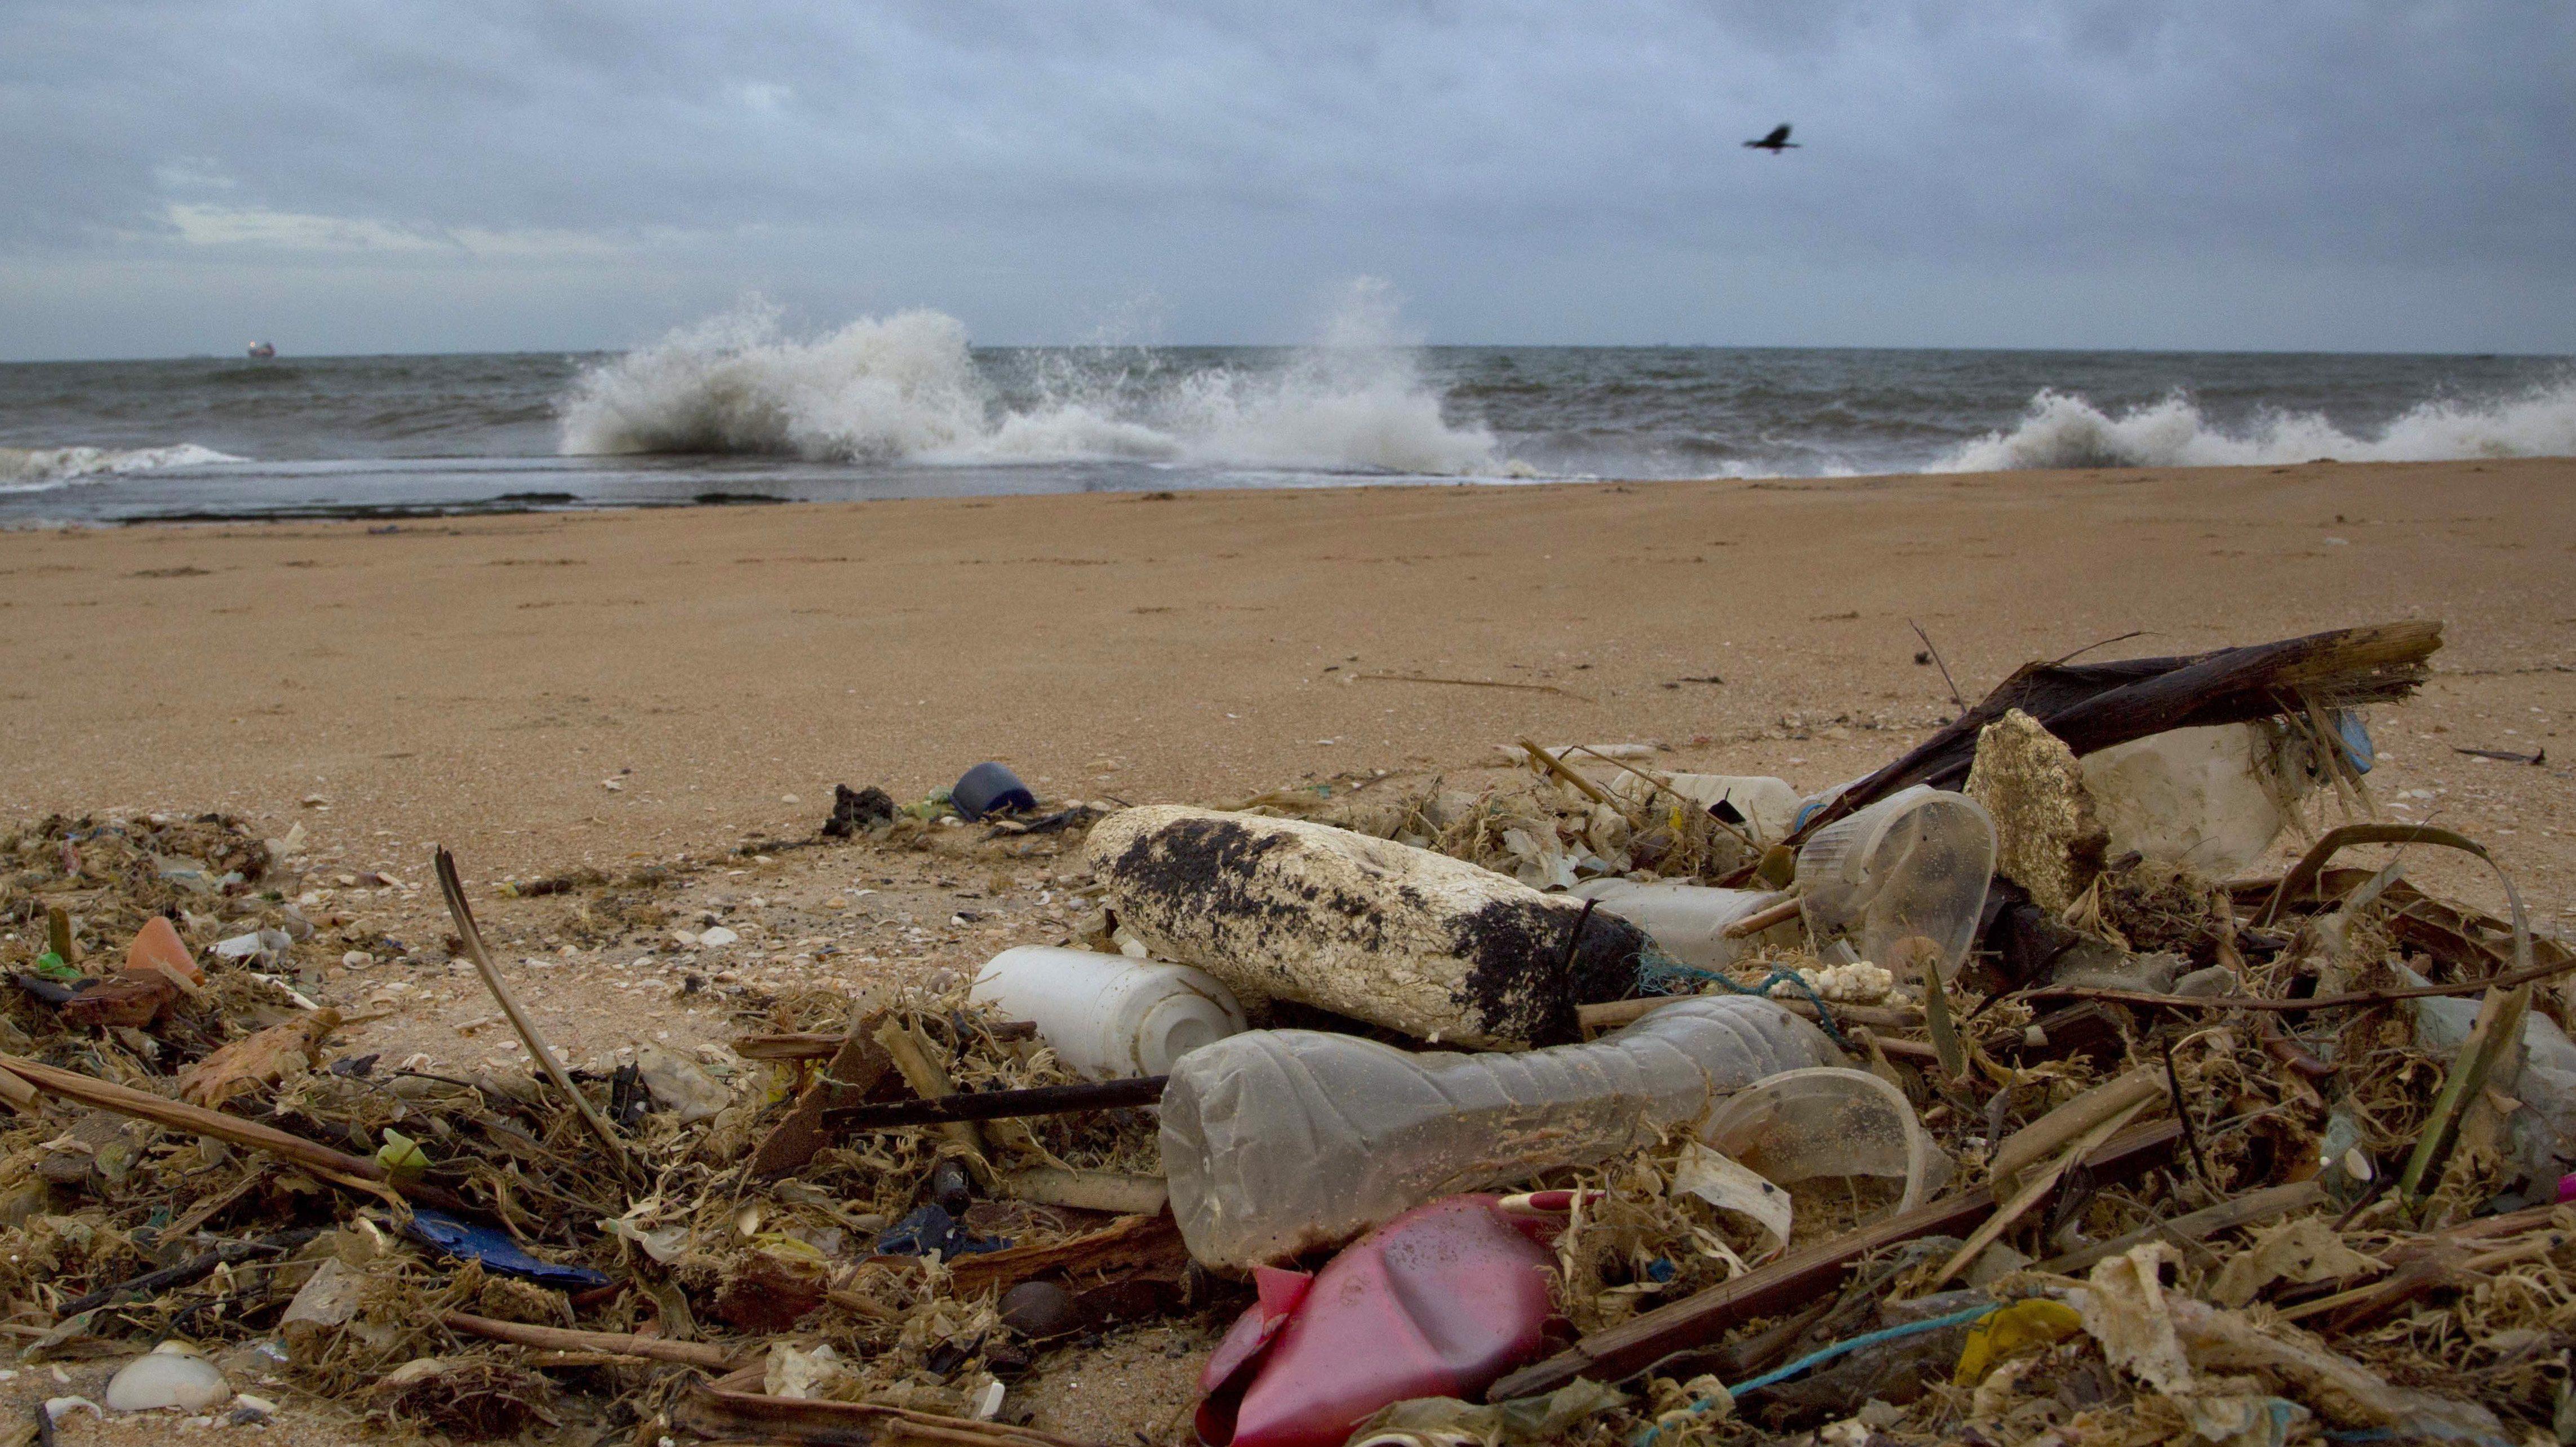 a plastic bottle lies among other debris washed ashore on the Indian Ocean beach of Uswetakeiyawa, north of Colombo, Sri Lanka.